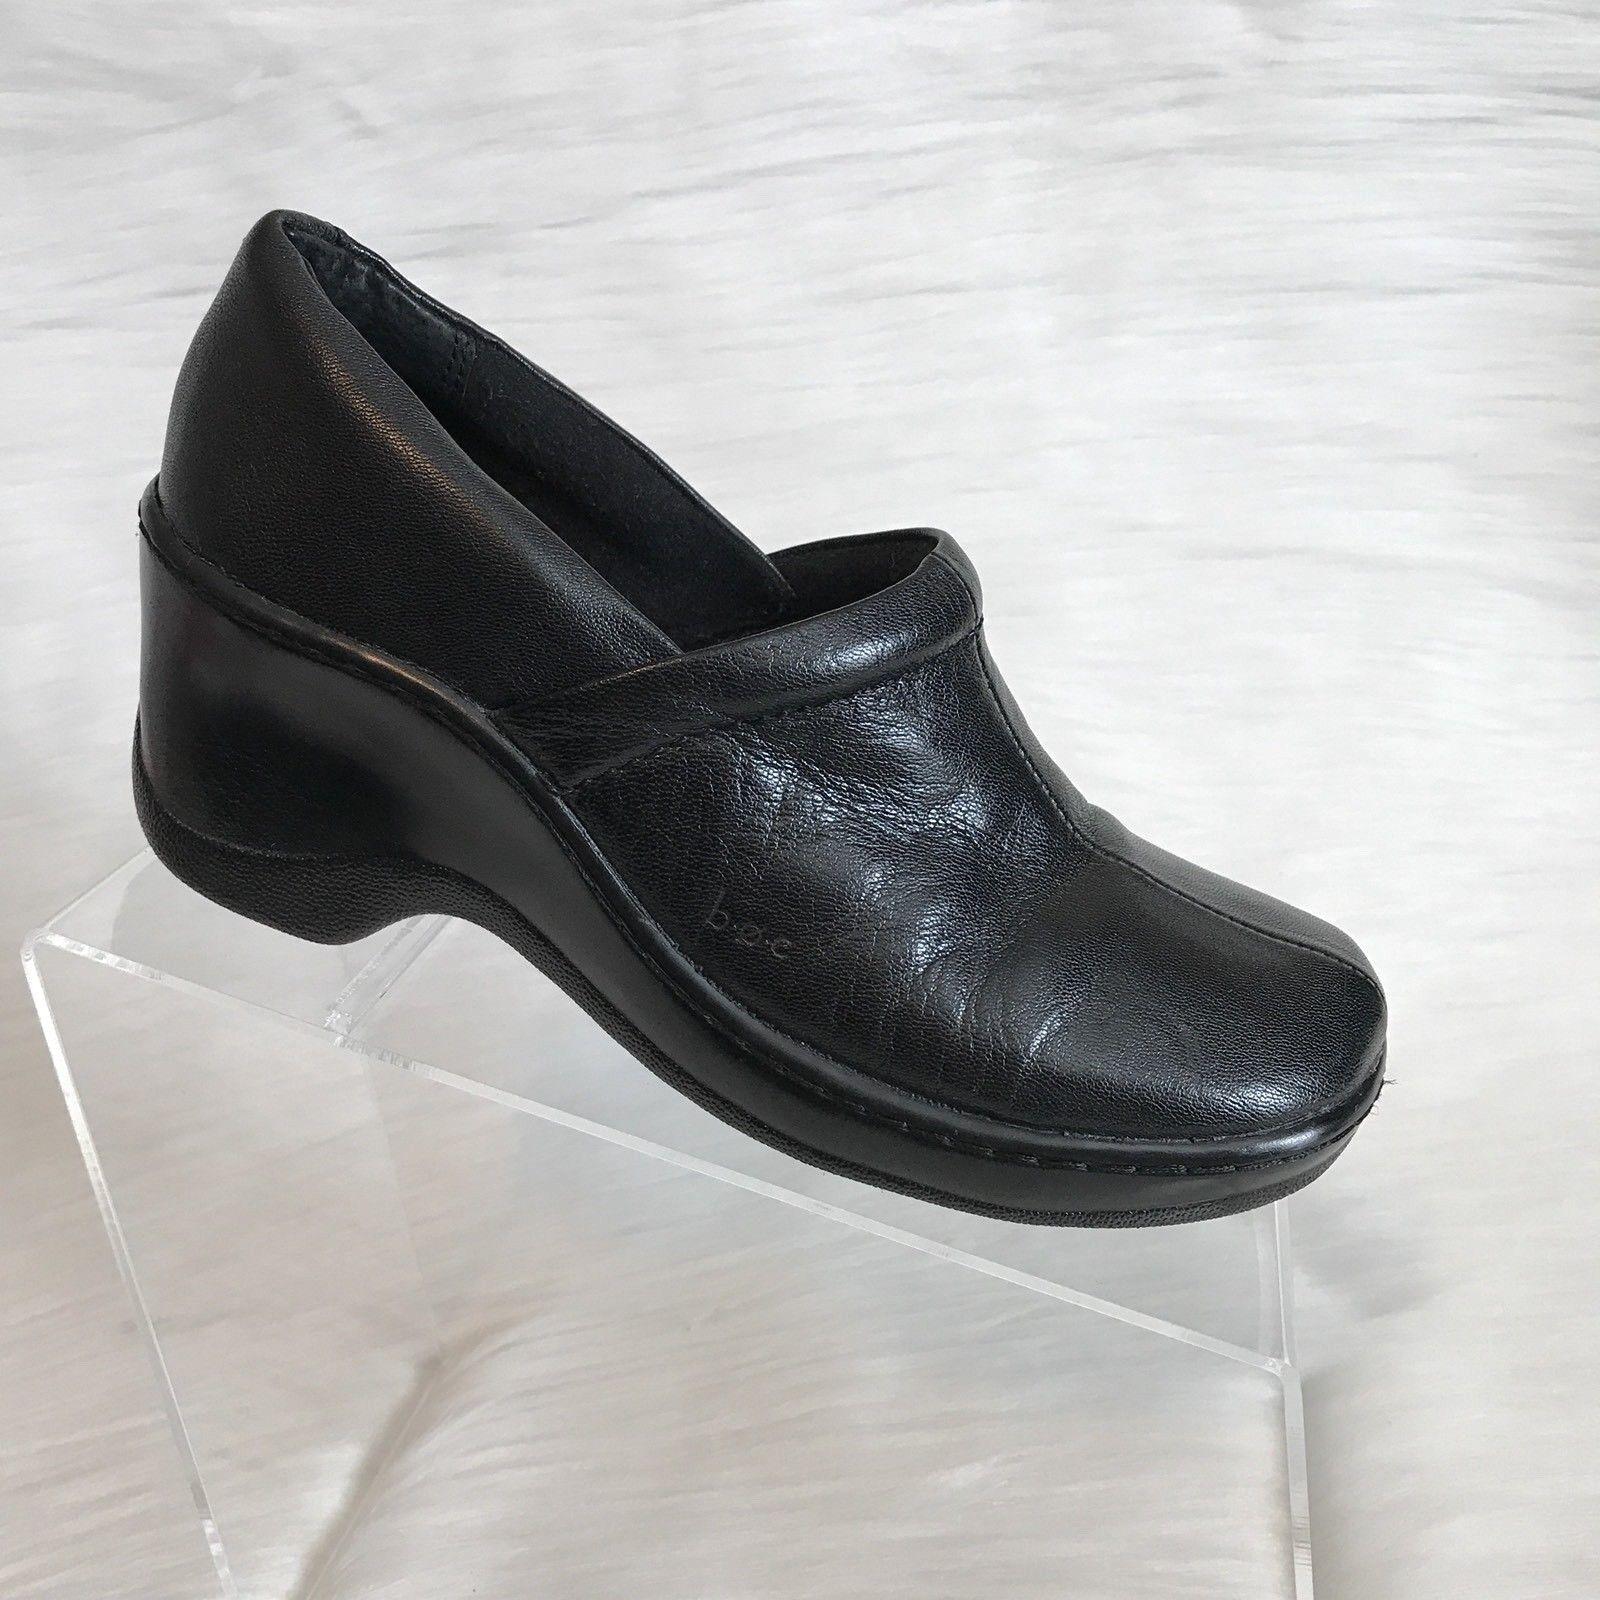 Boc by Born women's clogs black leather casual comfort shoes size 7.5 M